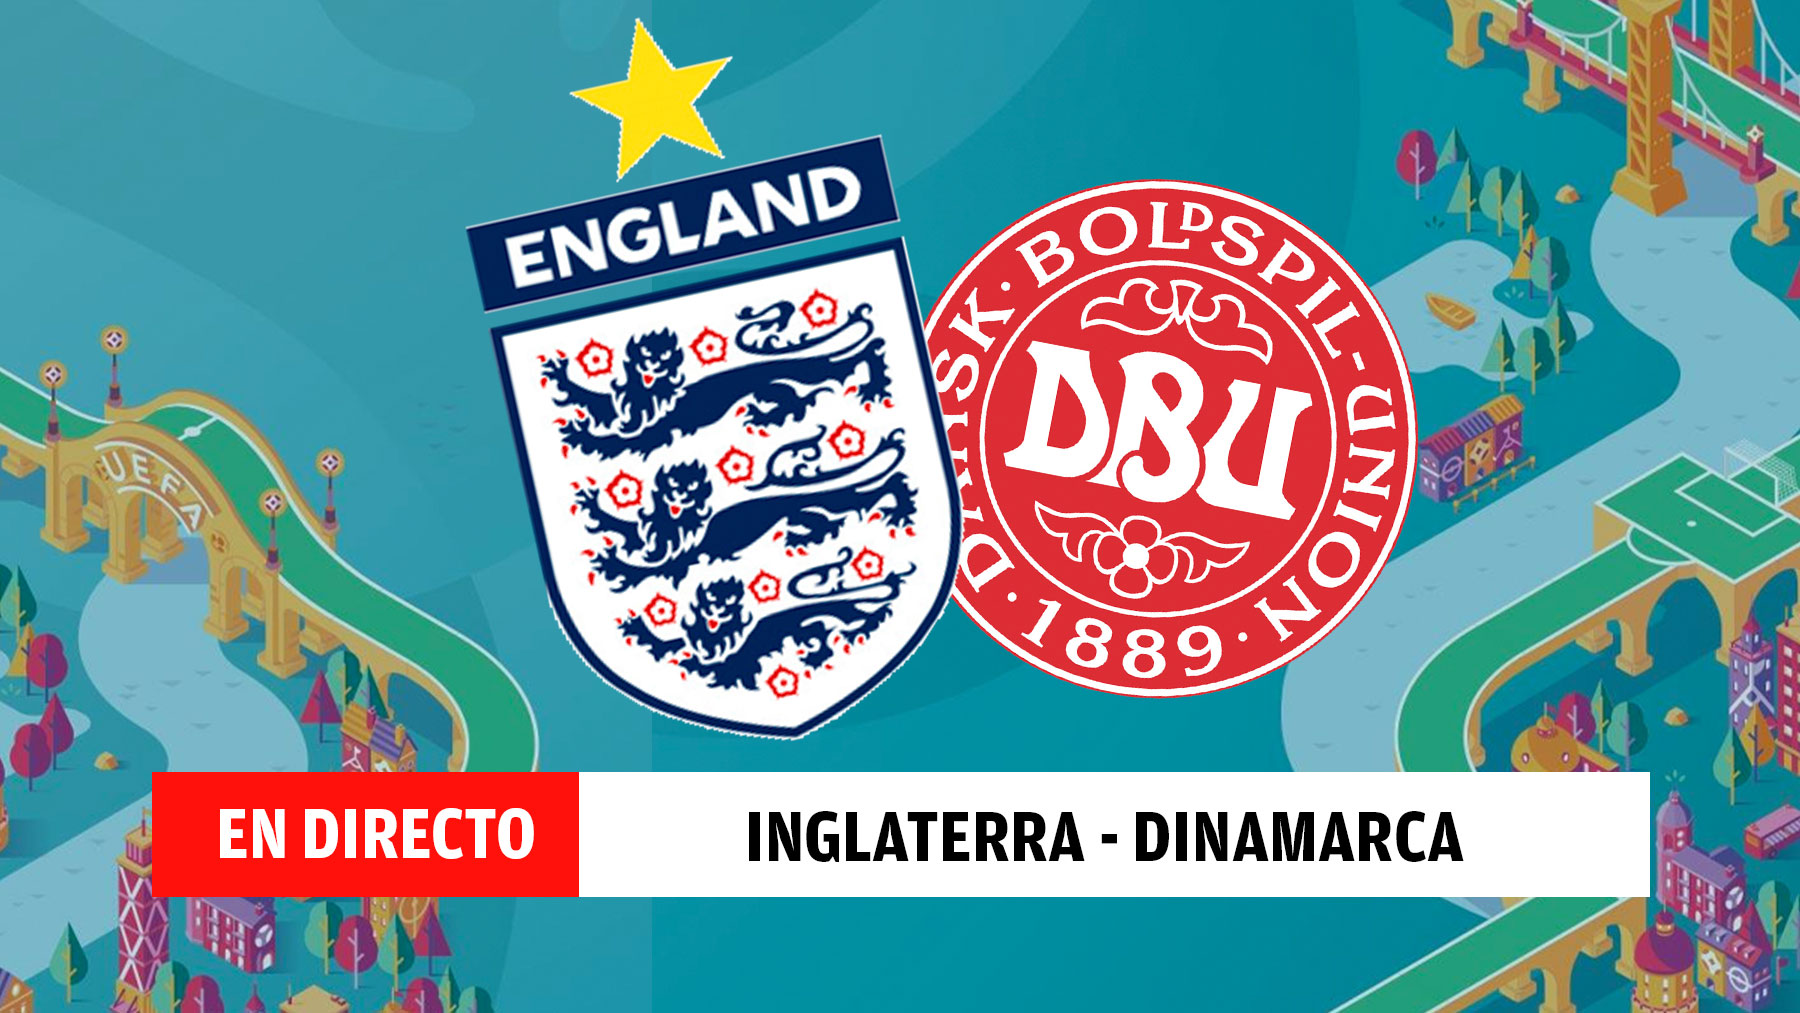 Inglaterra – Dinamarca | Eurocopa 2020, en directo